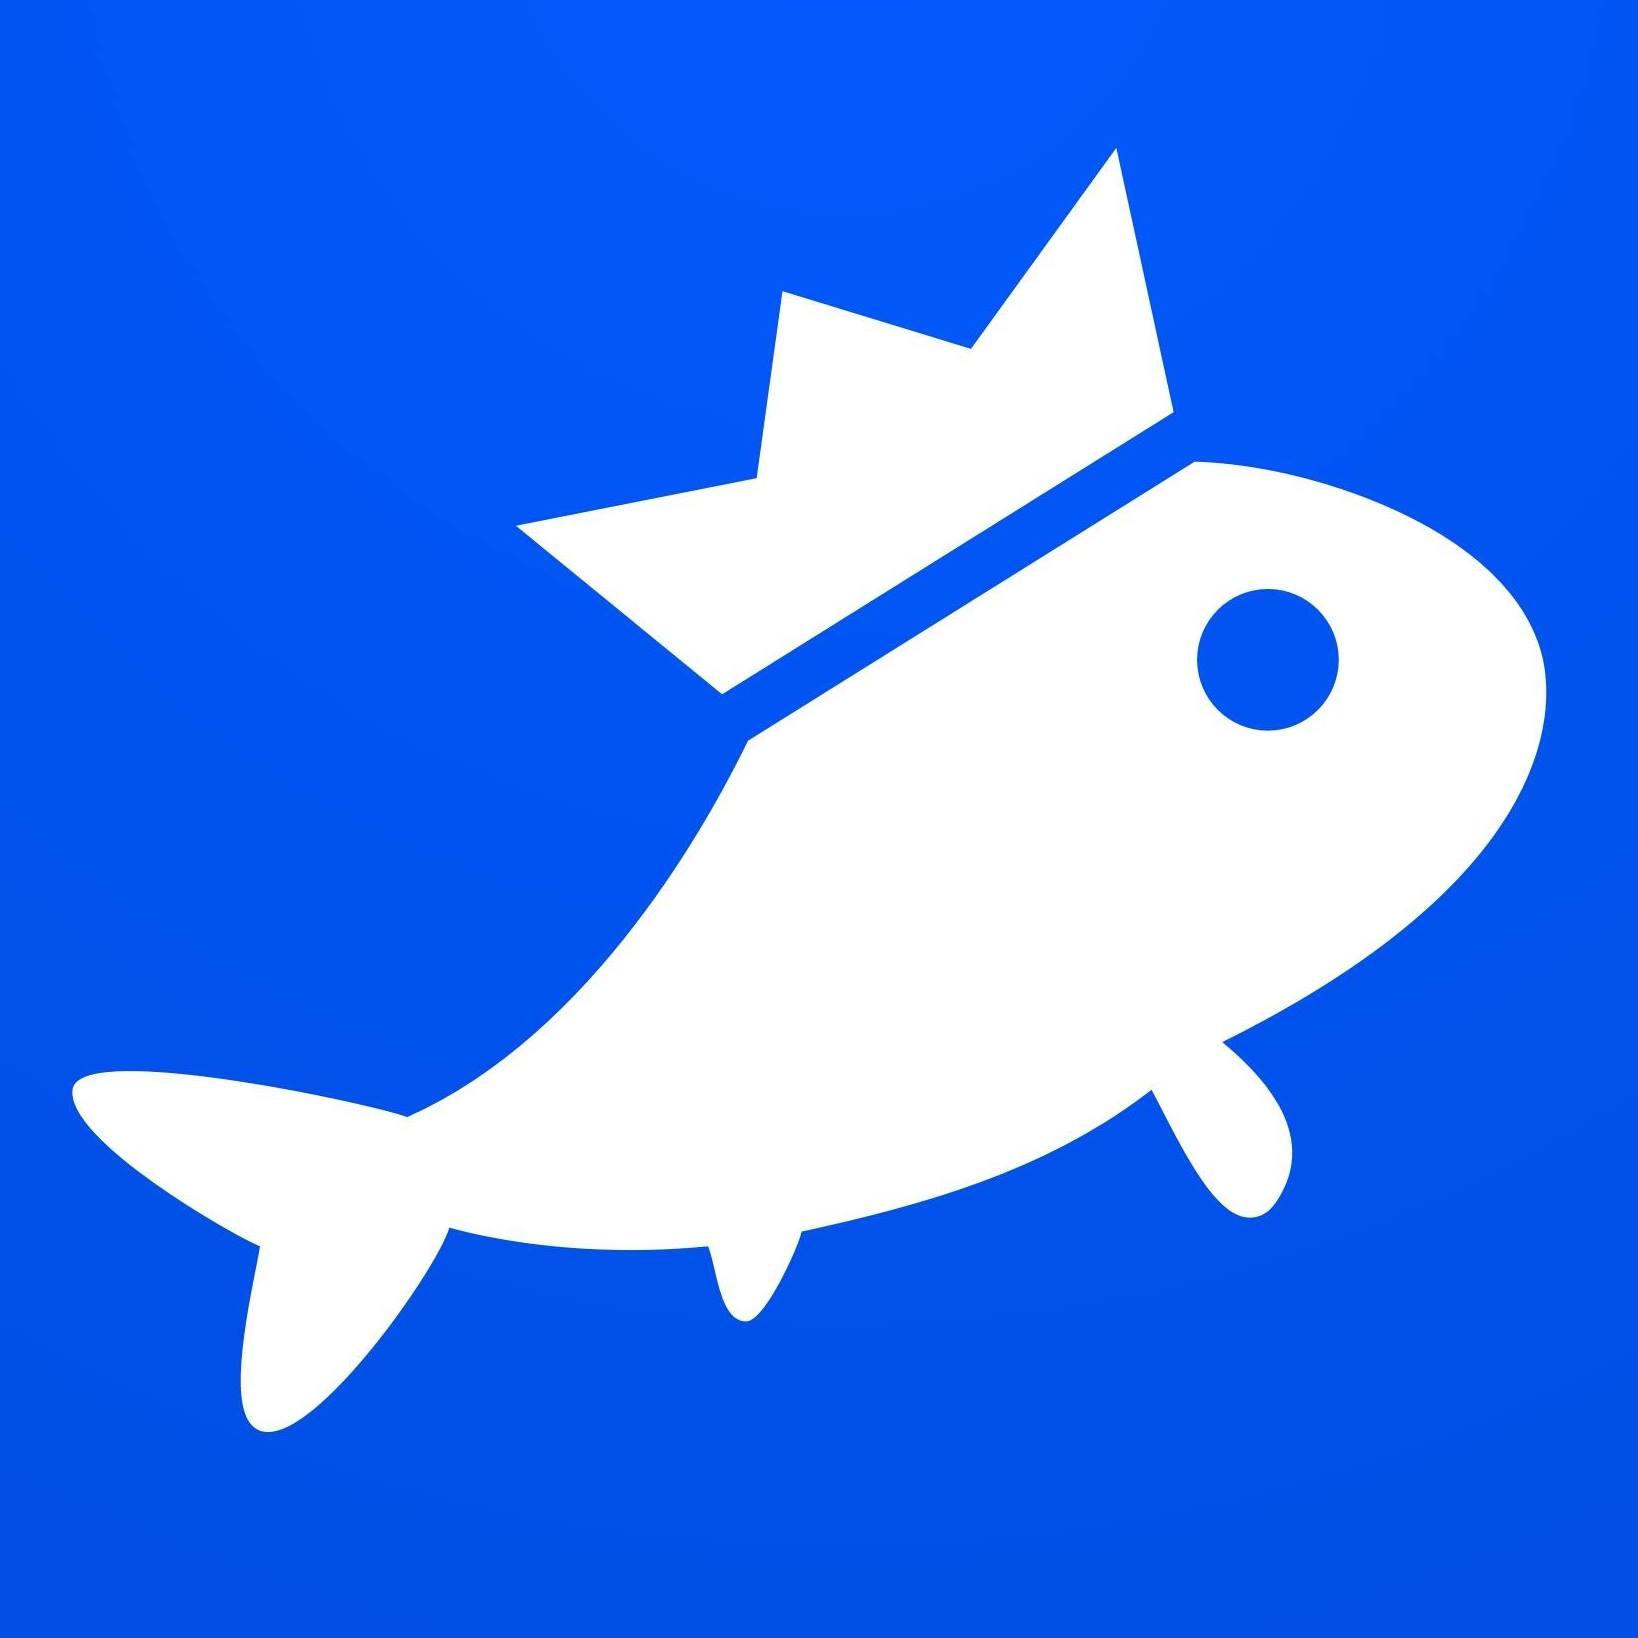 FishBrain's logo